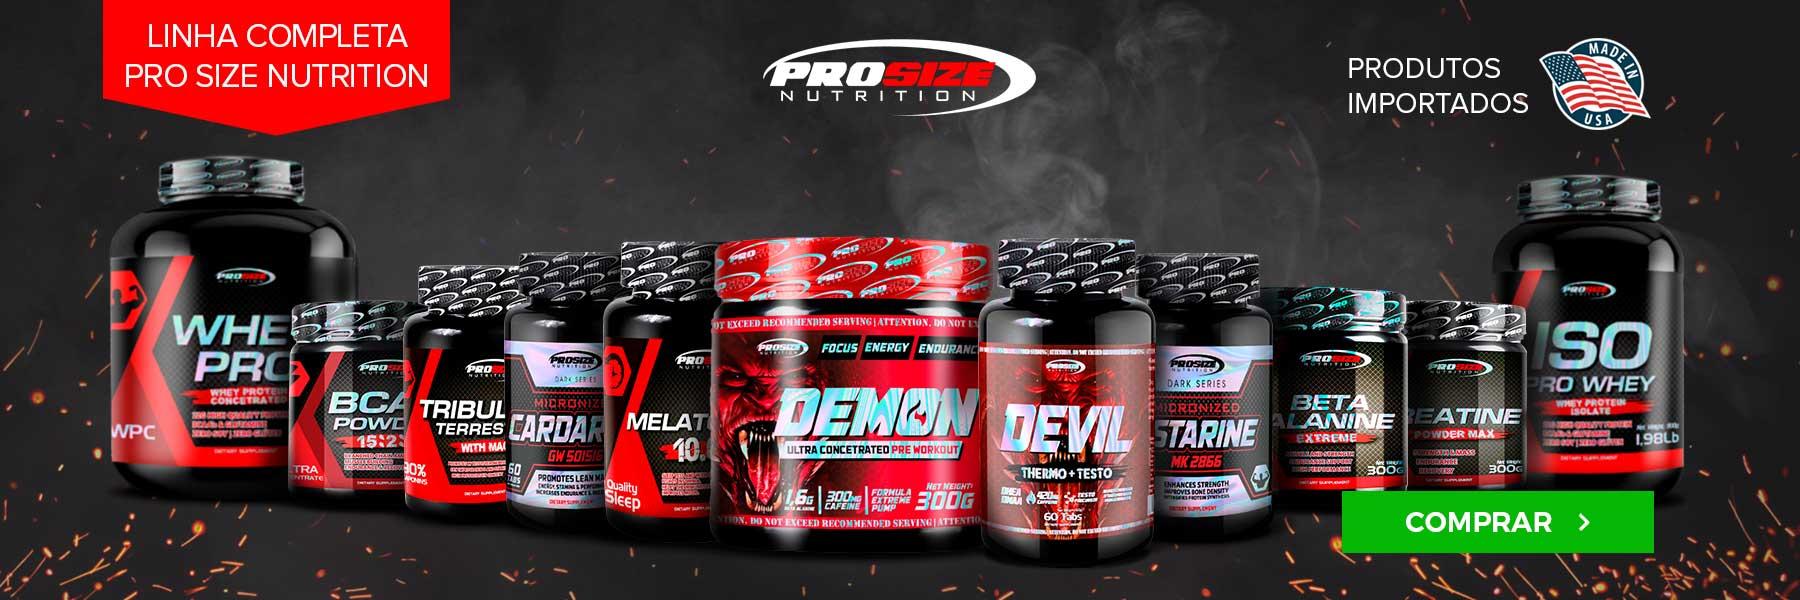 Linha Pro Size Nutrition